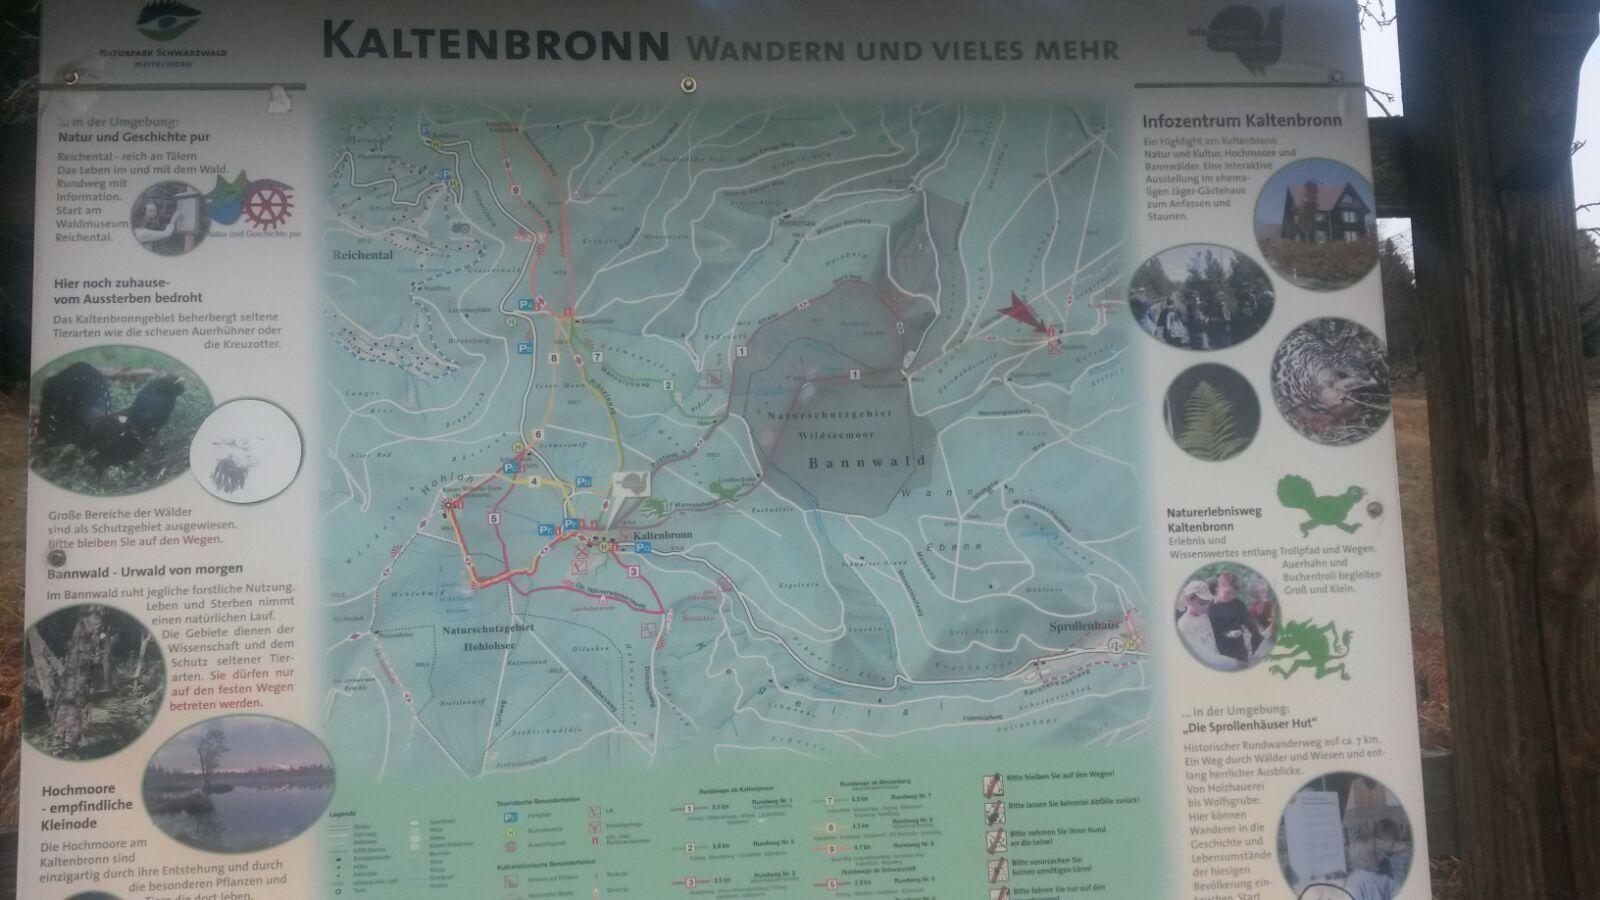 Wildseemoor Reiseblog Ü50 Wanderung